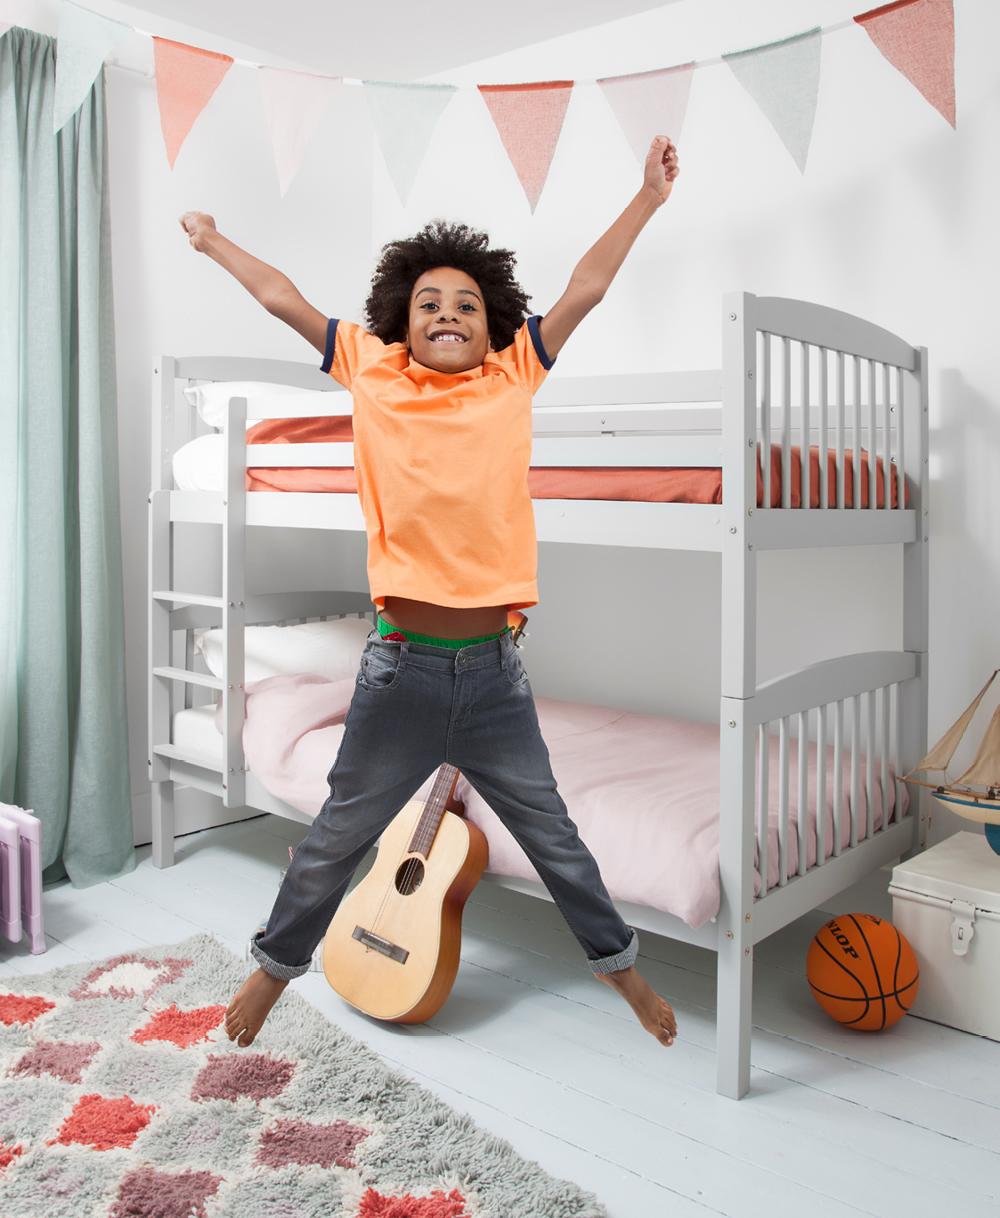 Childrens_Bedroom_Furniture_Photography_6.jpg